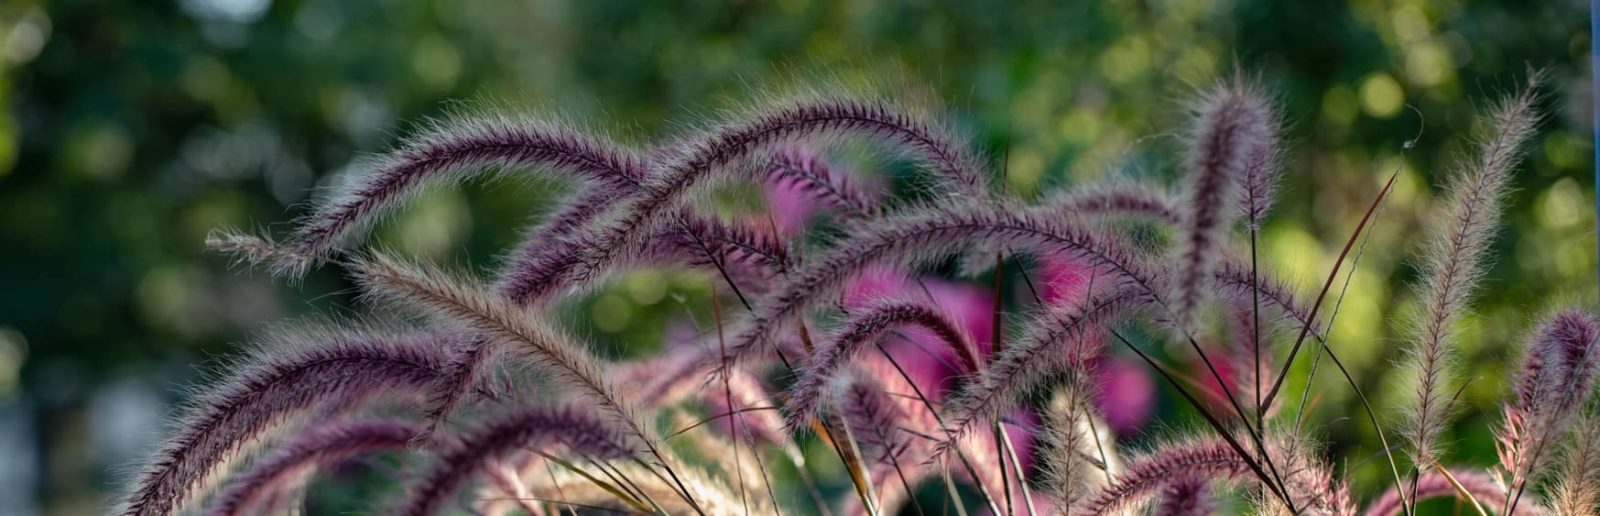 pennisetum grass up close